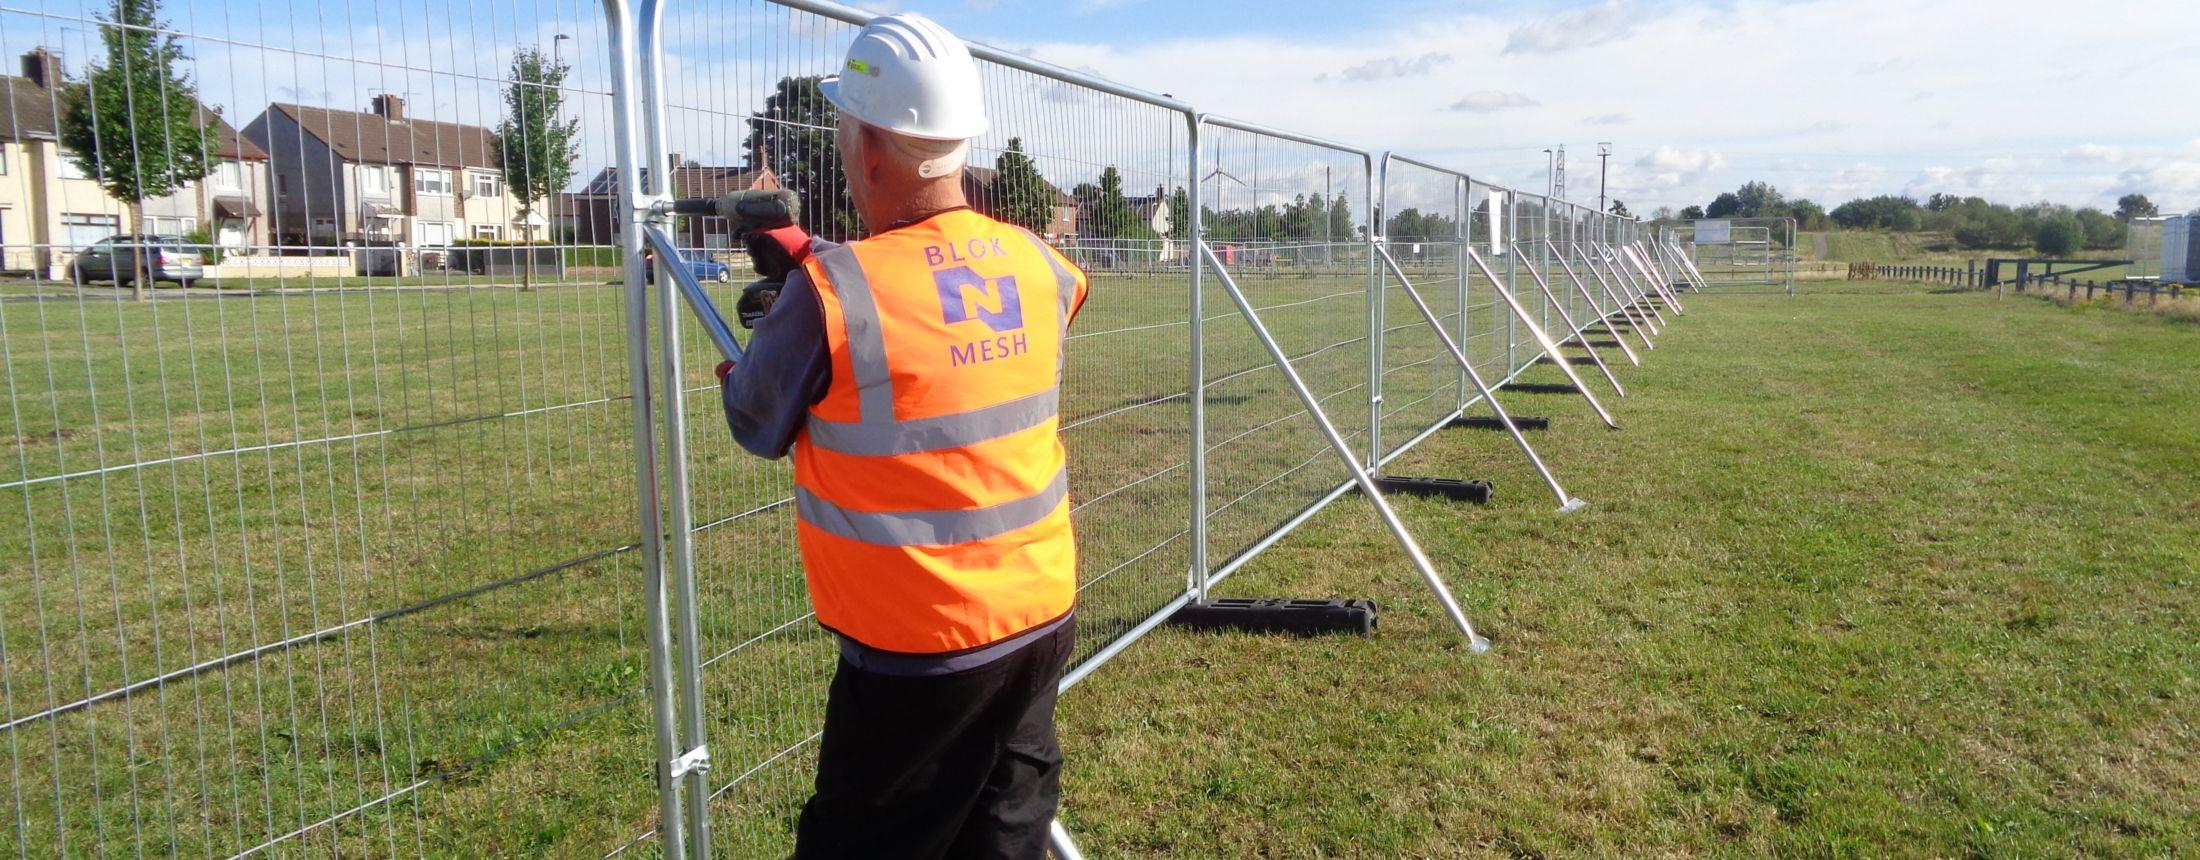 Fencing Hoarding Barriers For Fencing Contractors Blok N Mesh